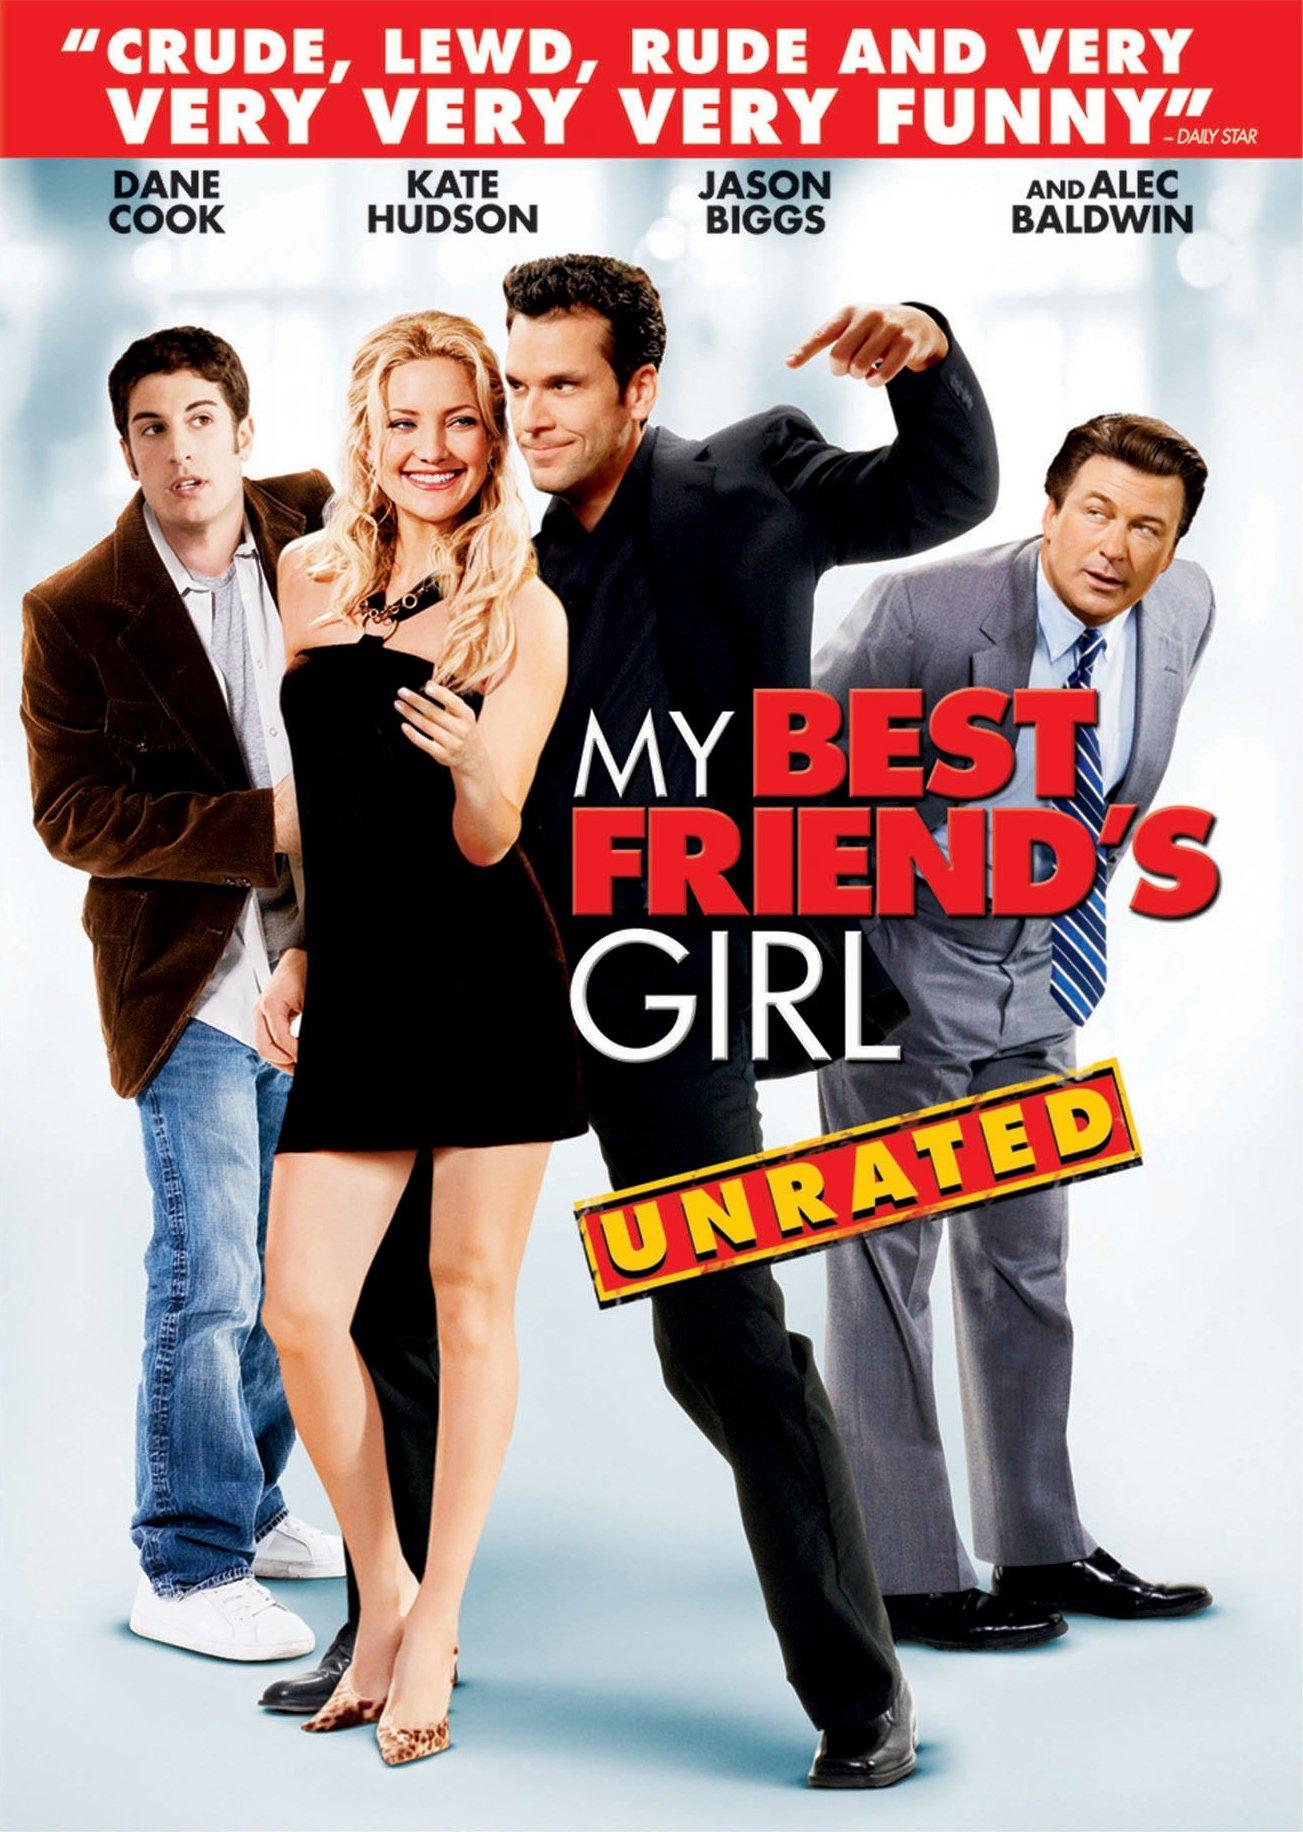 my best friends girl 2008 poster freemoviepostersnet